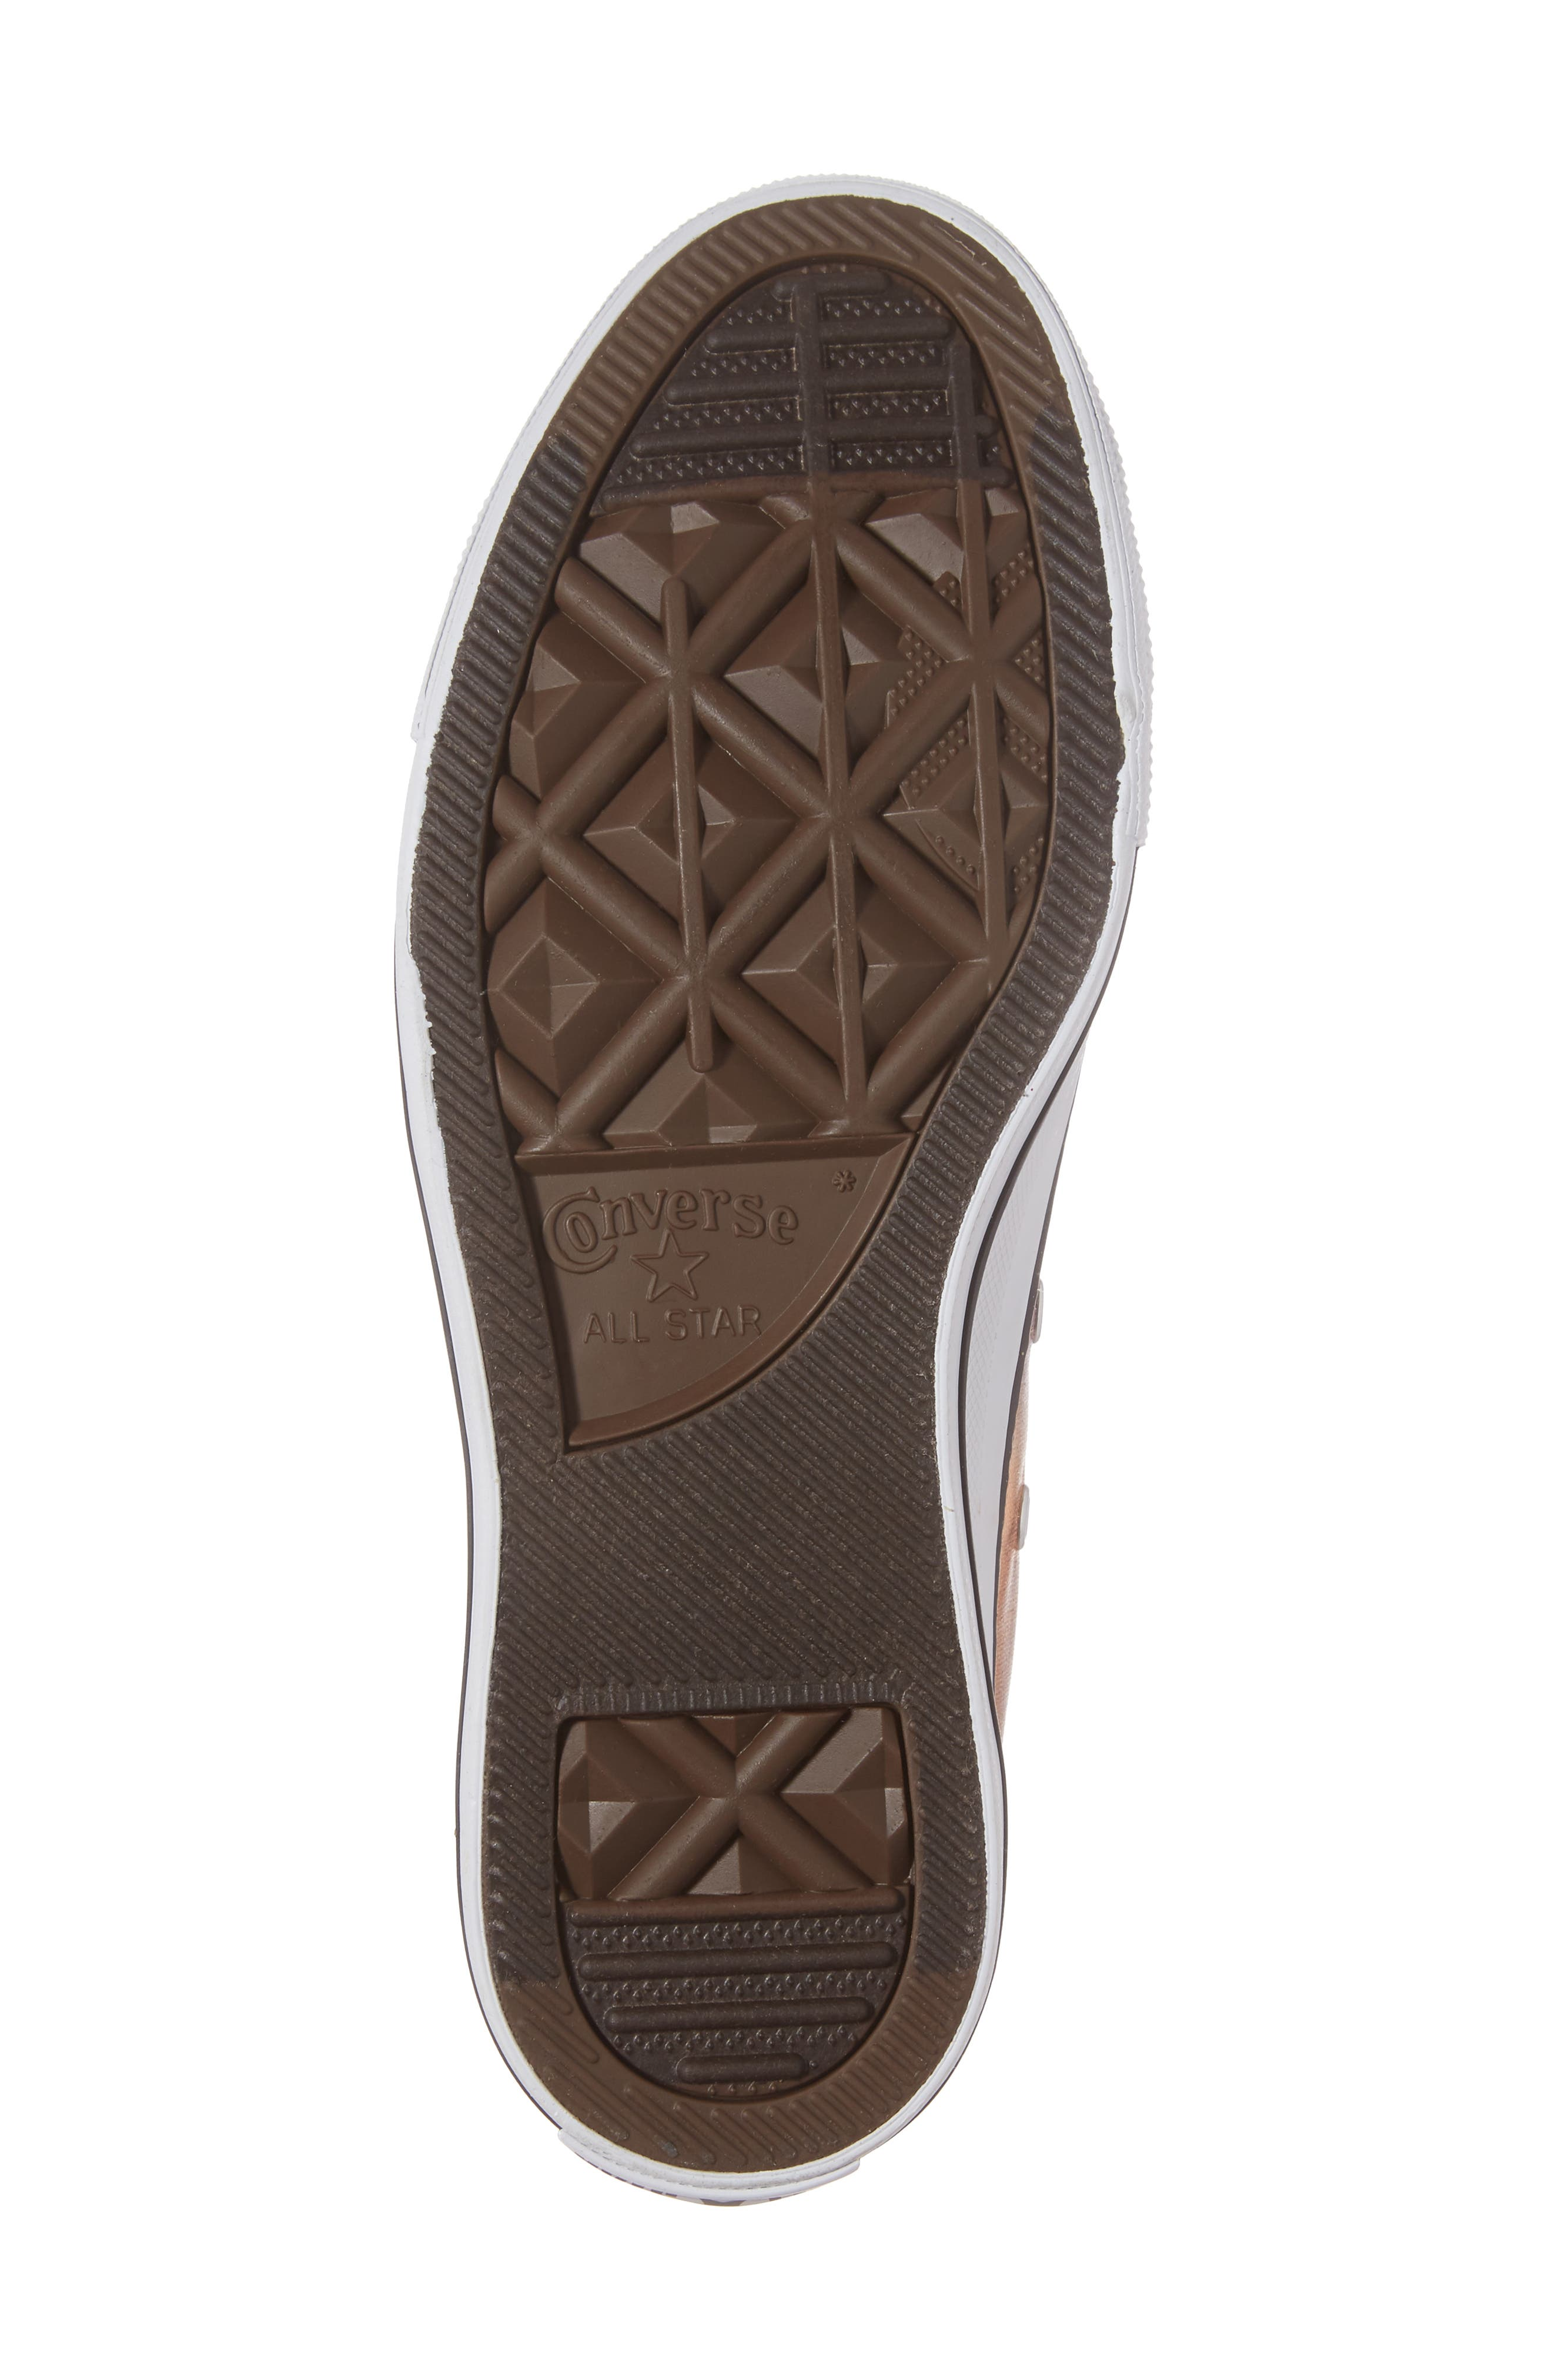 Chuck Taylor<sup>®</sup> All Star<sup>®</sup> Seasonal Metallic Ox Low Top Sneaker,                             Alternate thumbnail 6, color,                             Dusk Pink